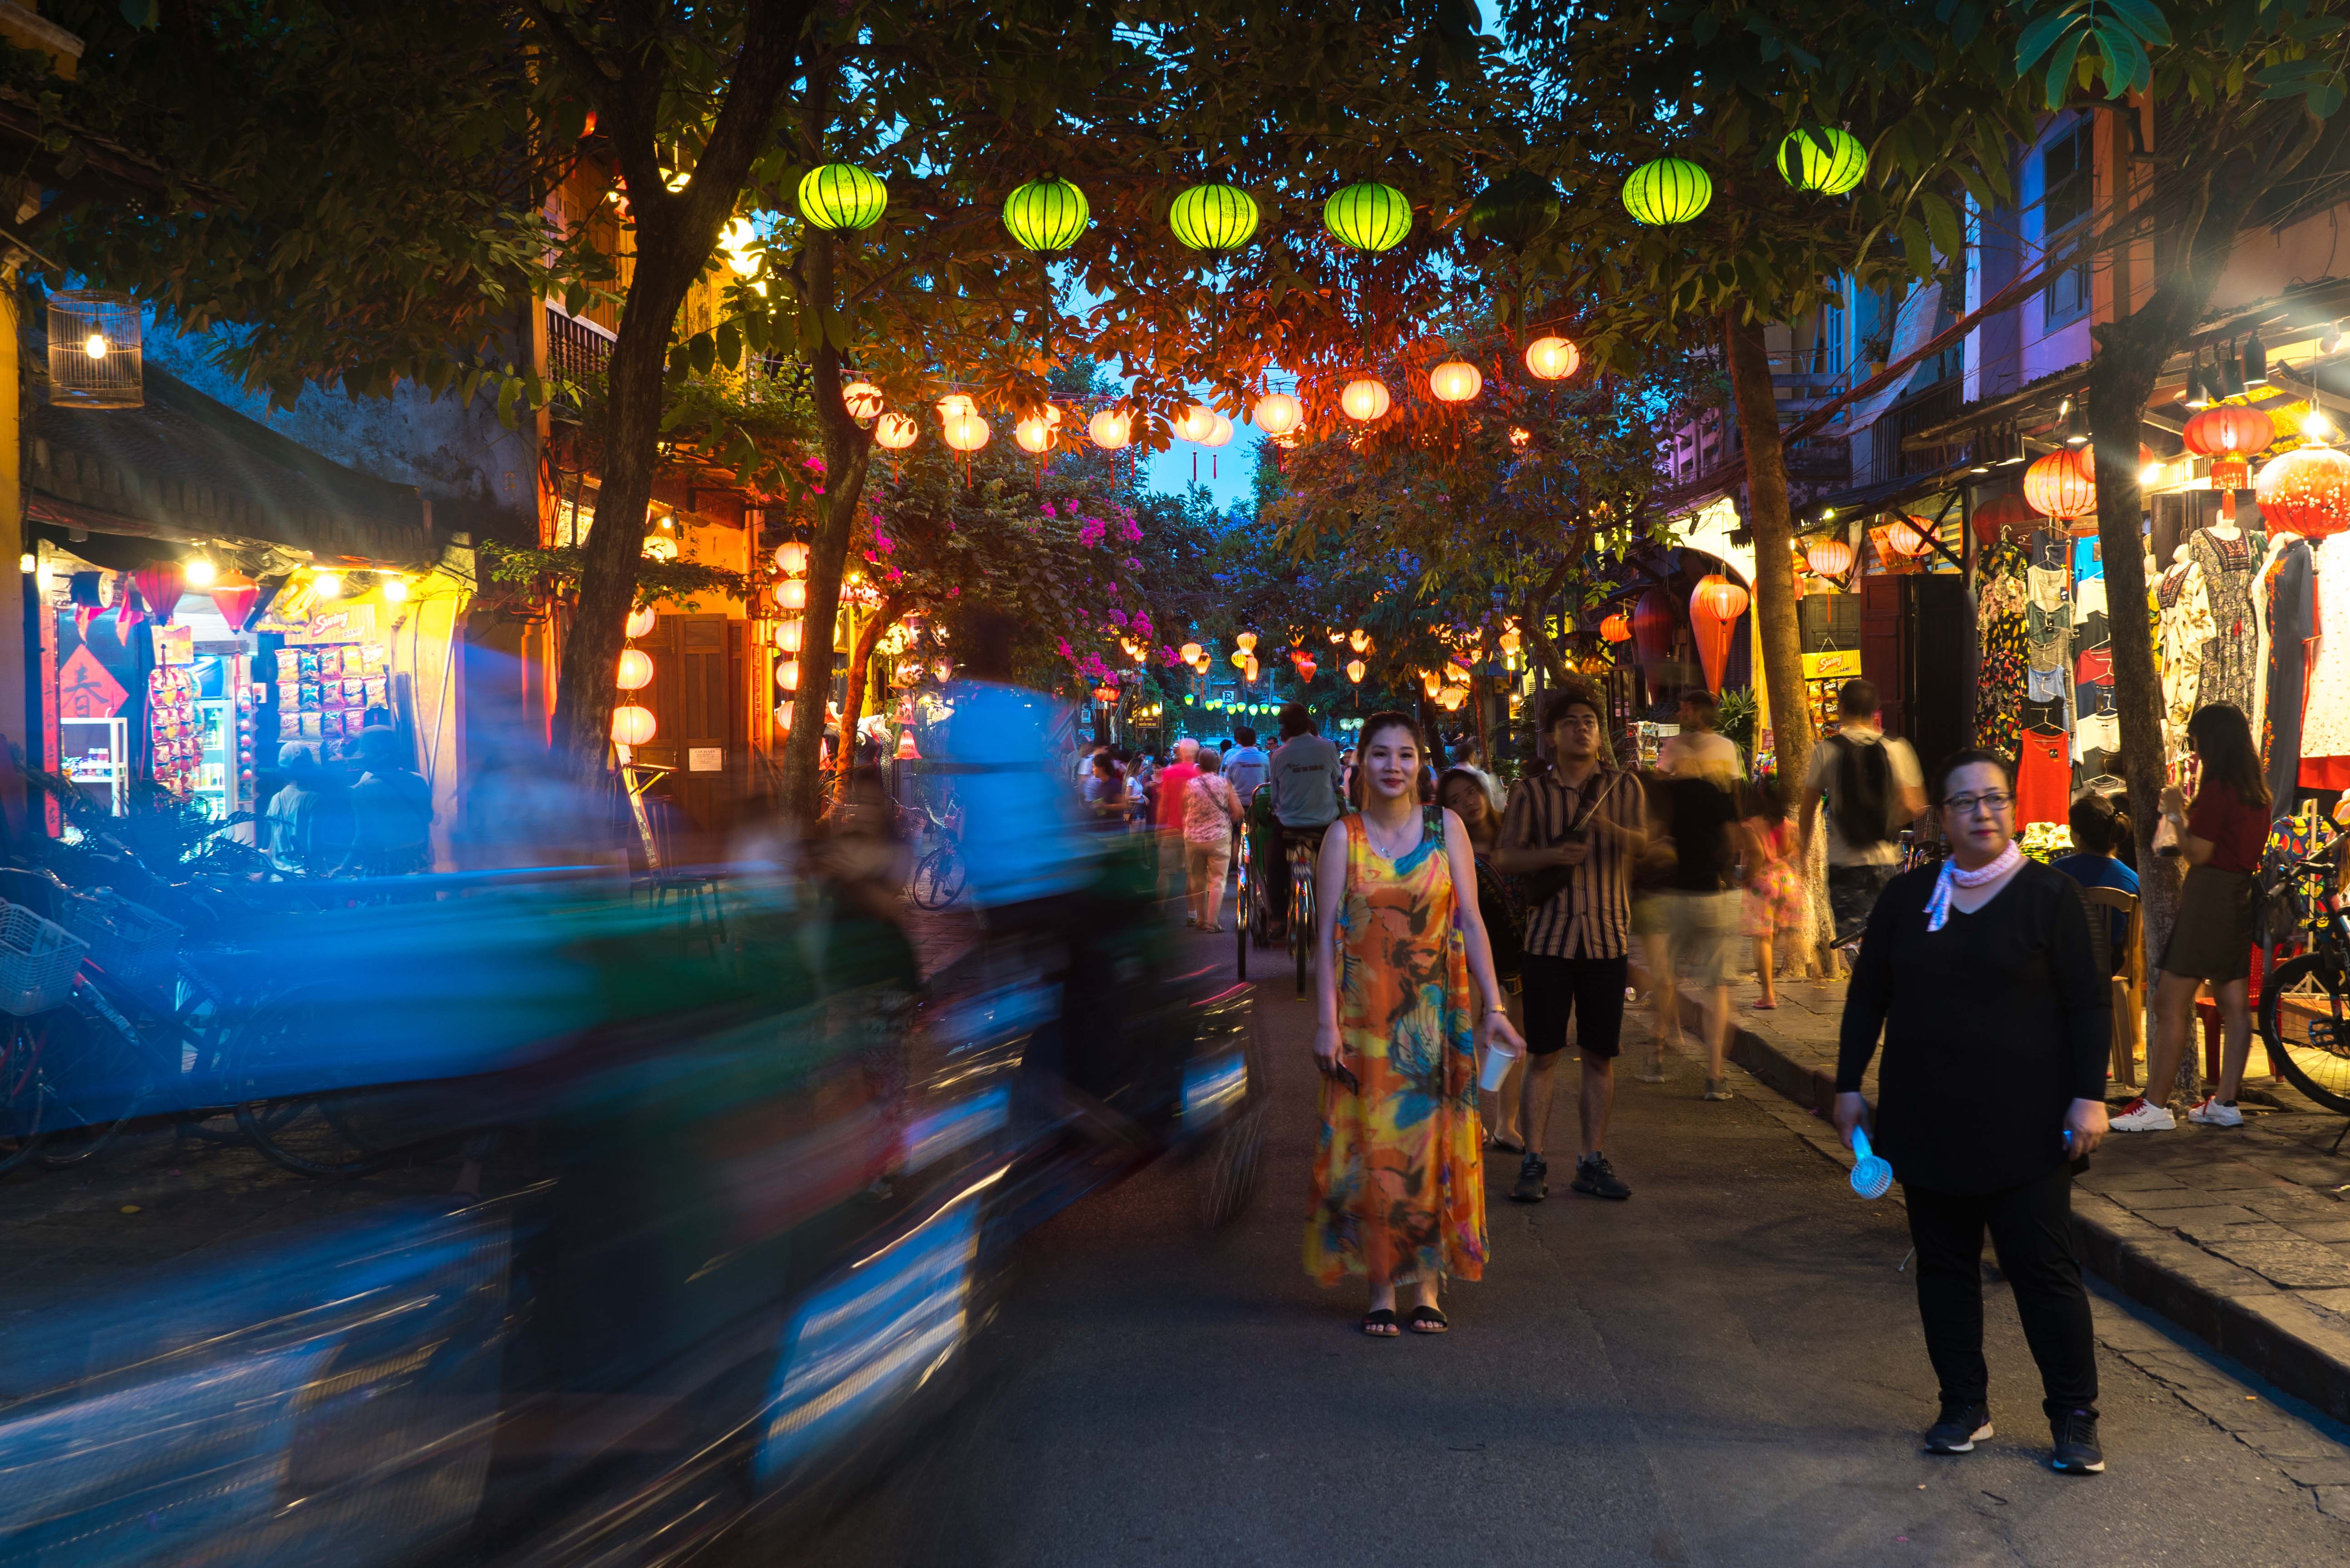 Lampióny v meste Hoi An